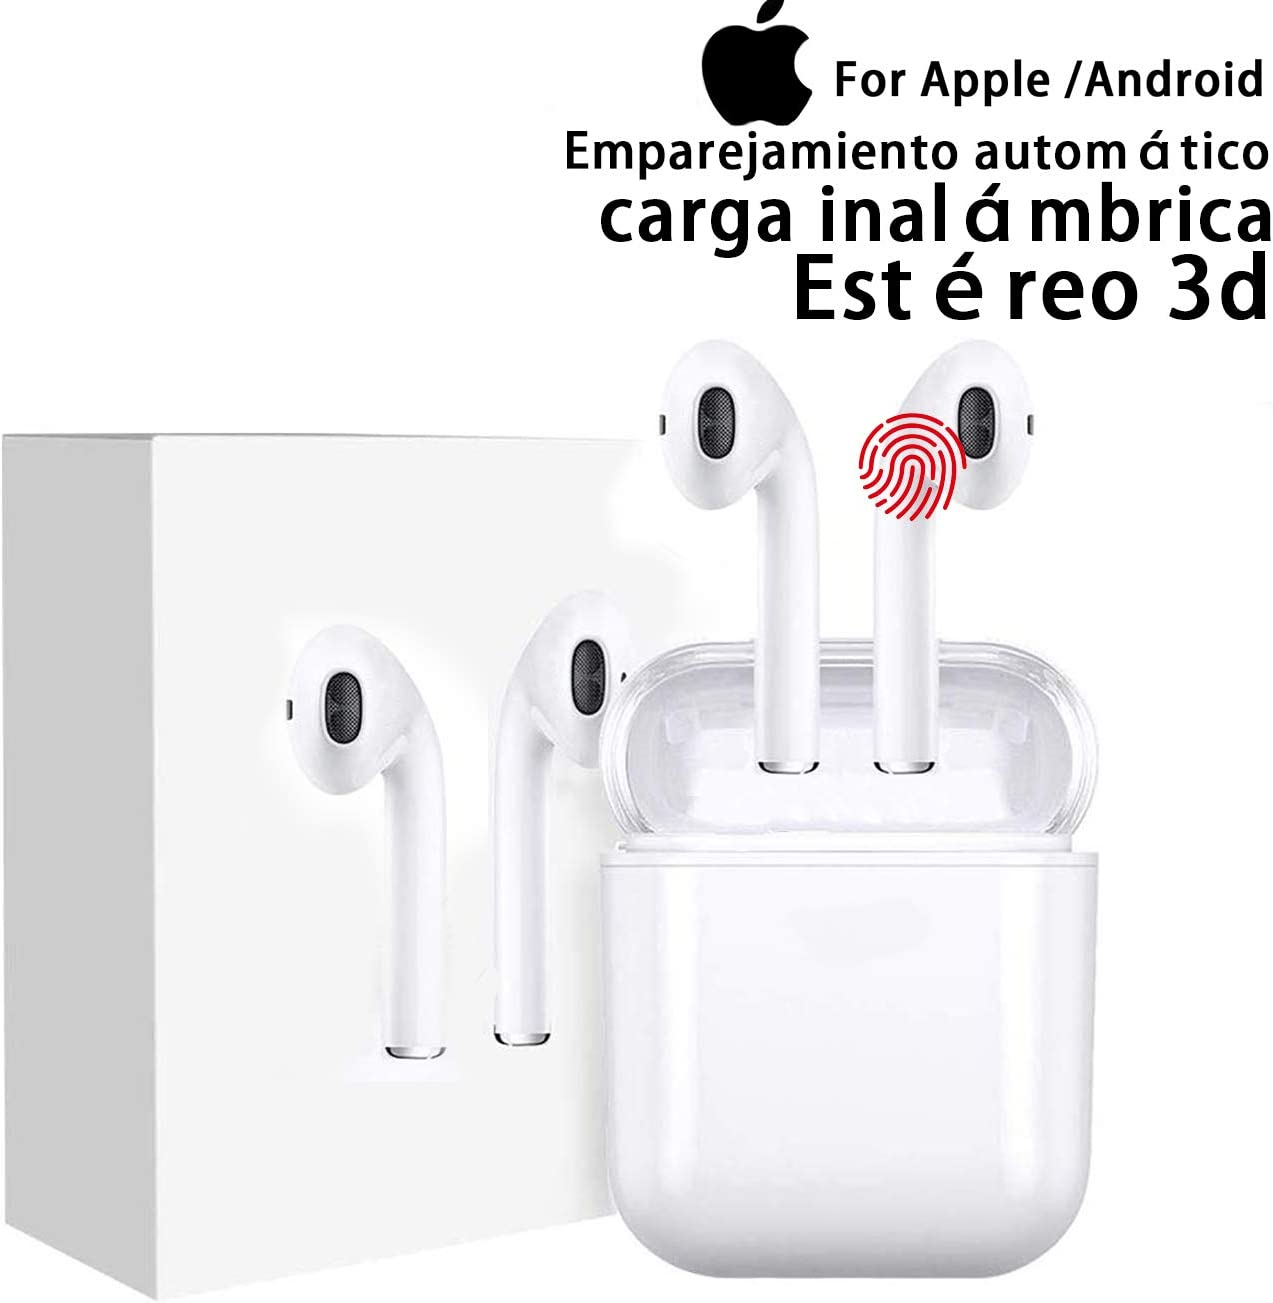 Auriculares inalámbricos Bluetooth 5.0, Auriculares inalámbricos internos, IPX7 a Prueba de Agua, reducción de Ruido estéreo 3D, Compatible con iPhone/Huawei/Samsung/Airpods Pro (2.ª generación